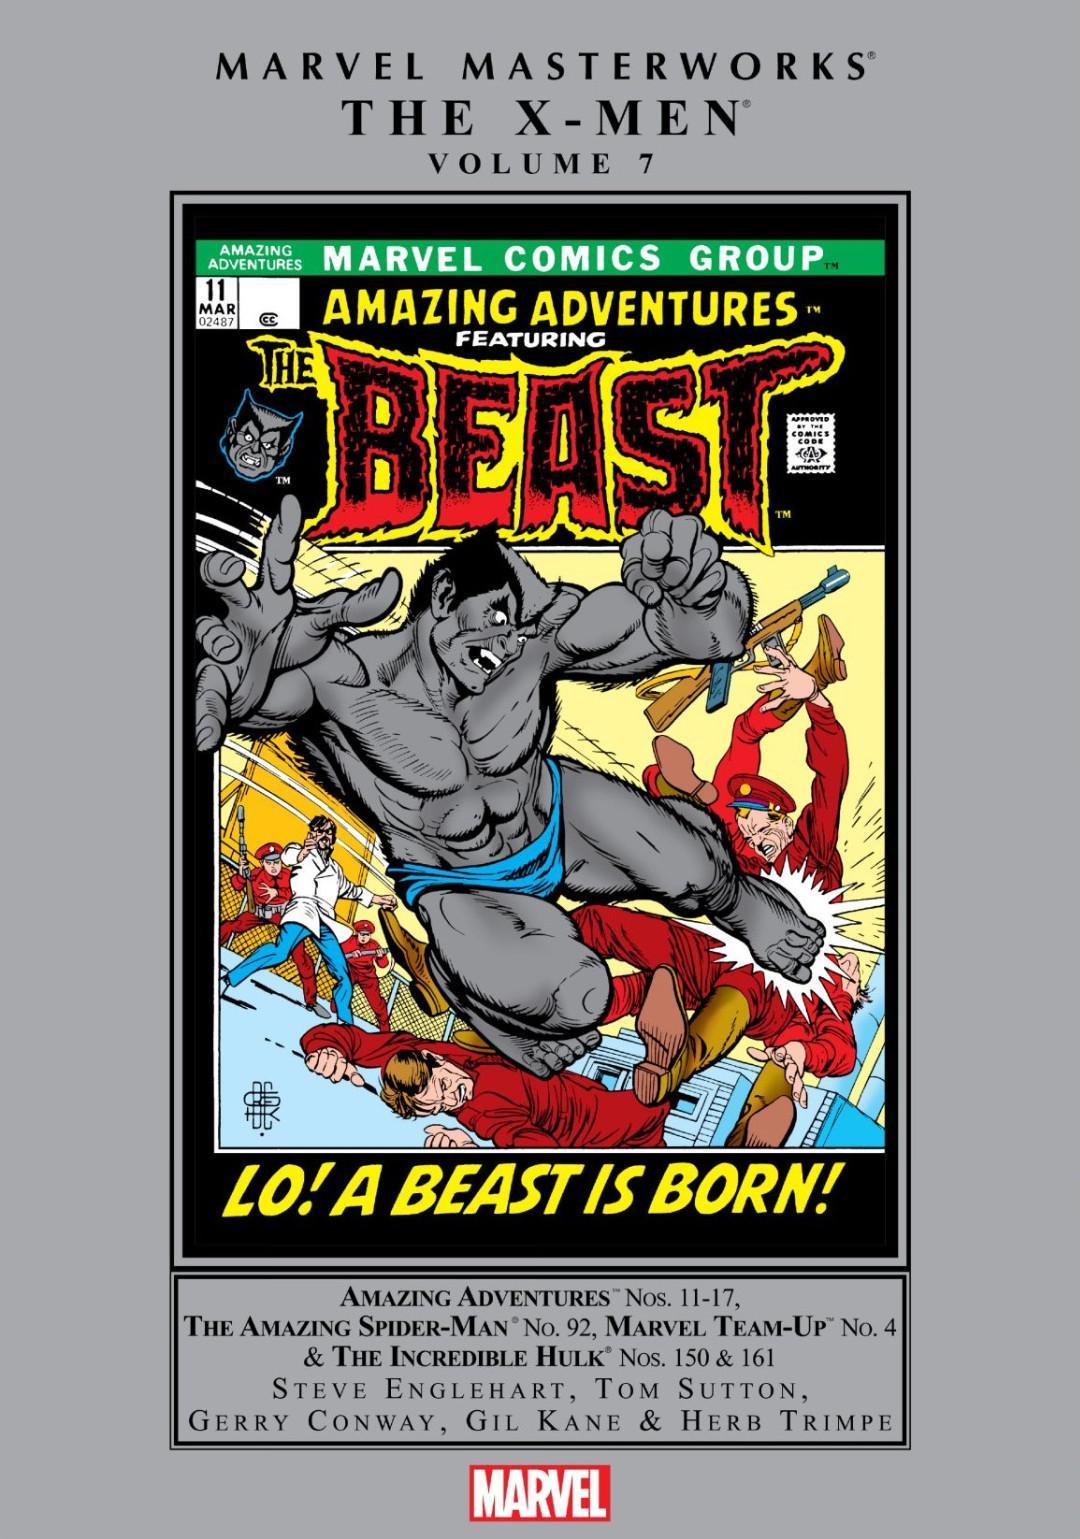 Re: REQ: Anyone have Marvel Masterworks: X